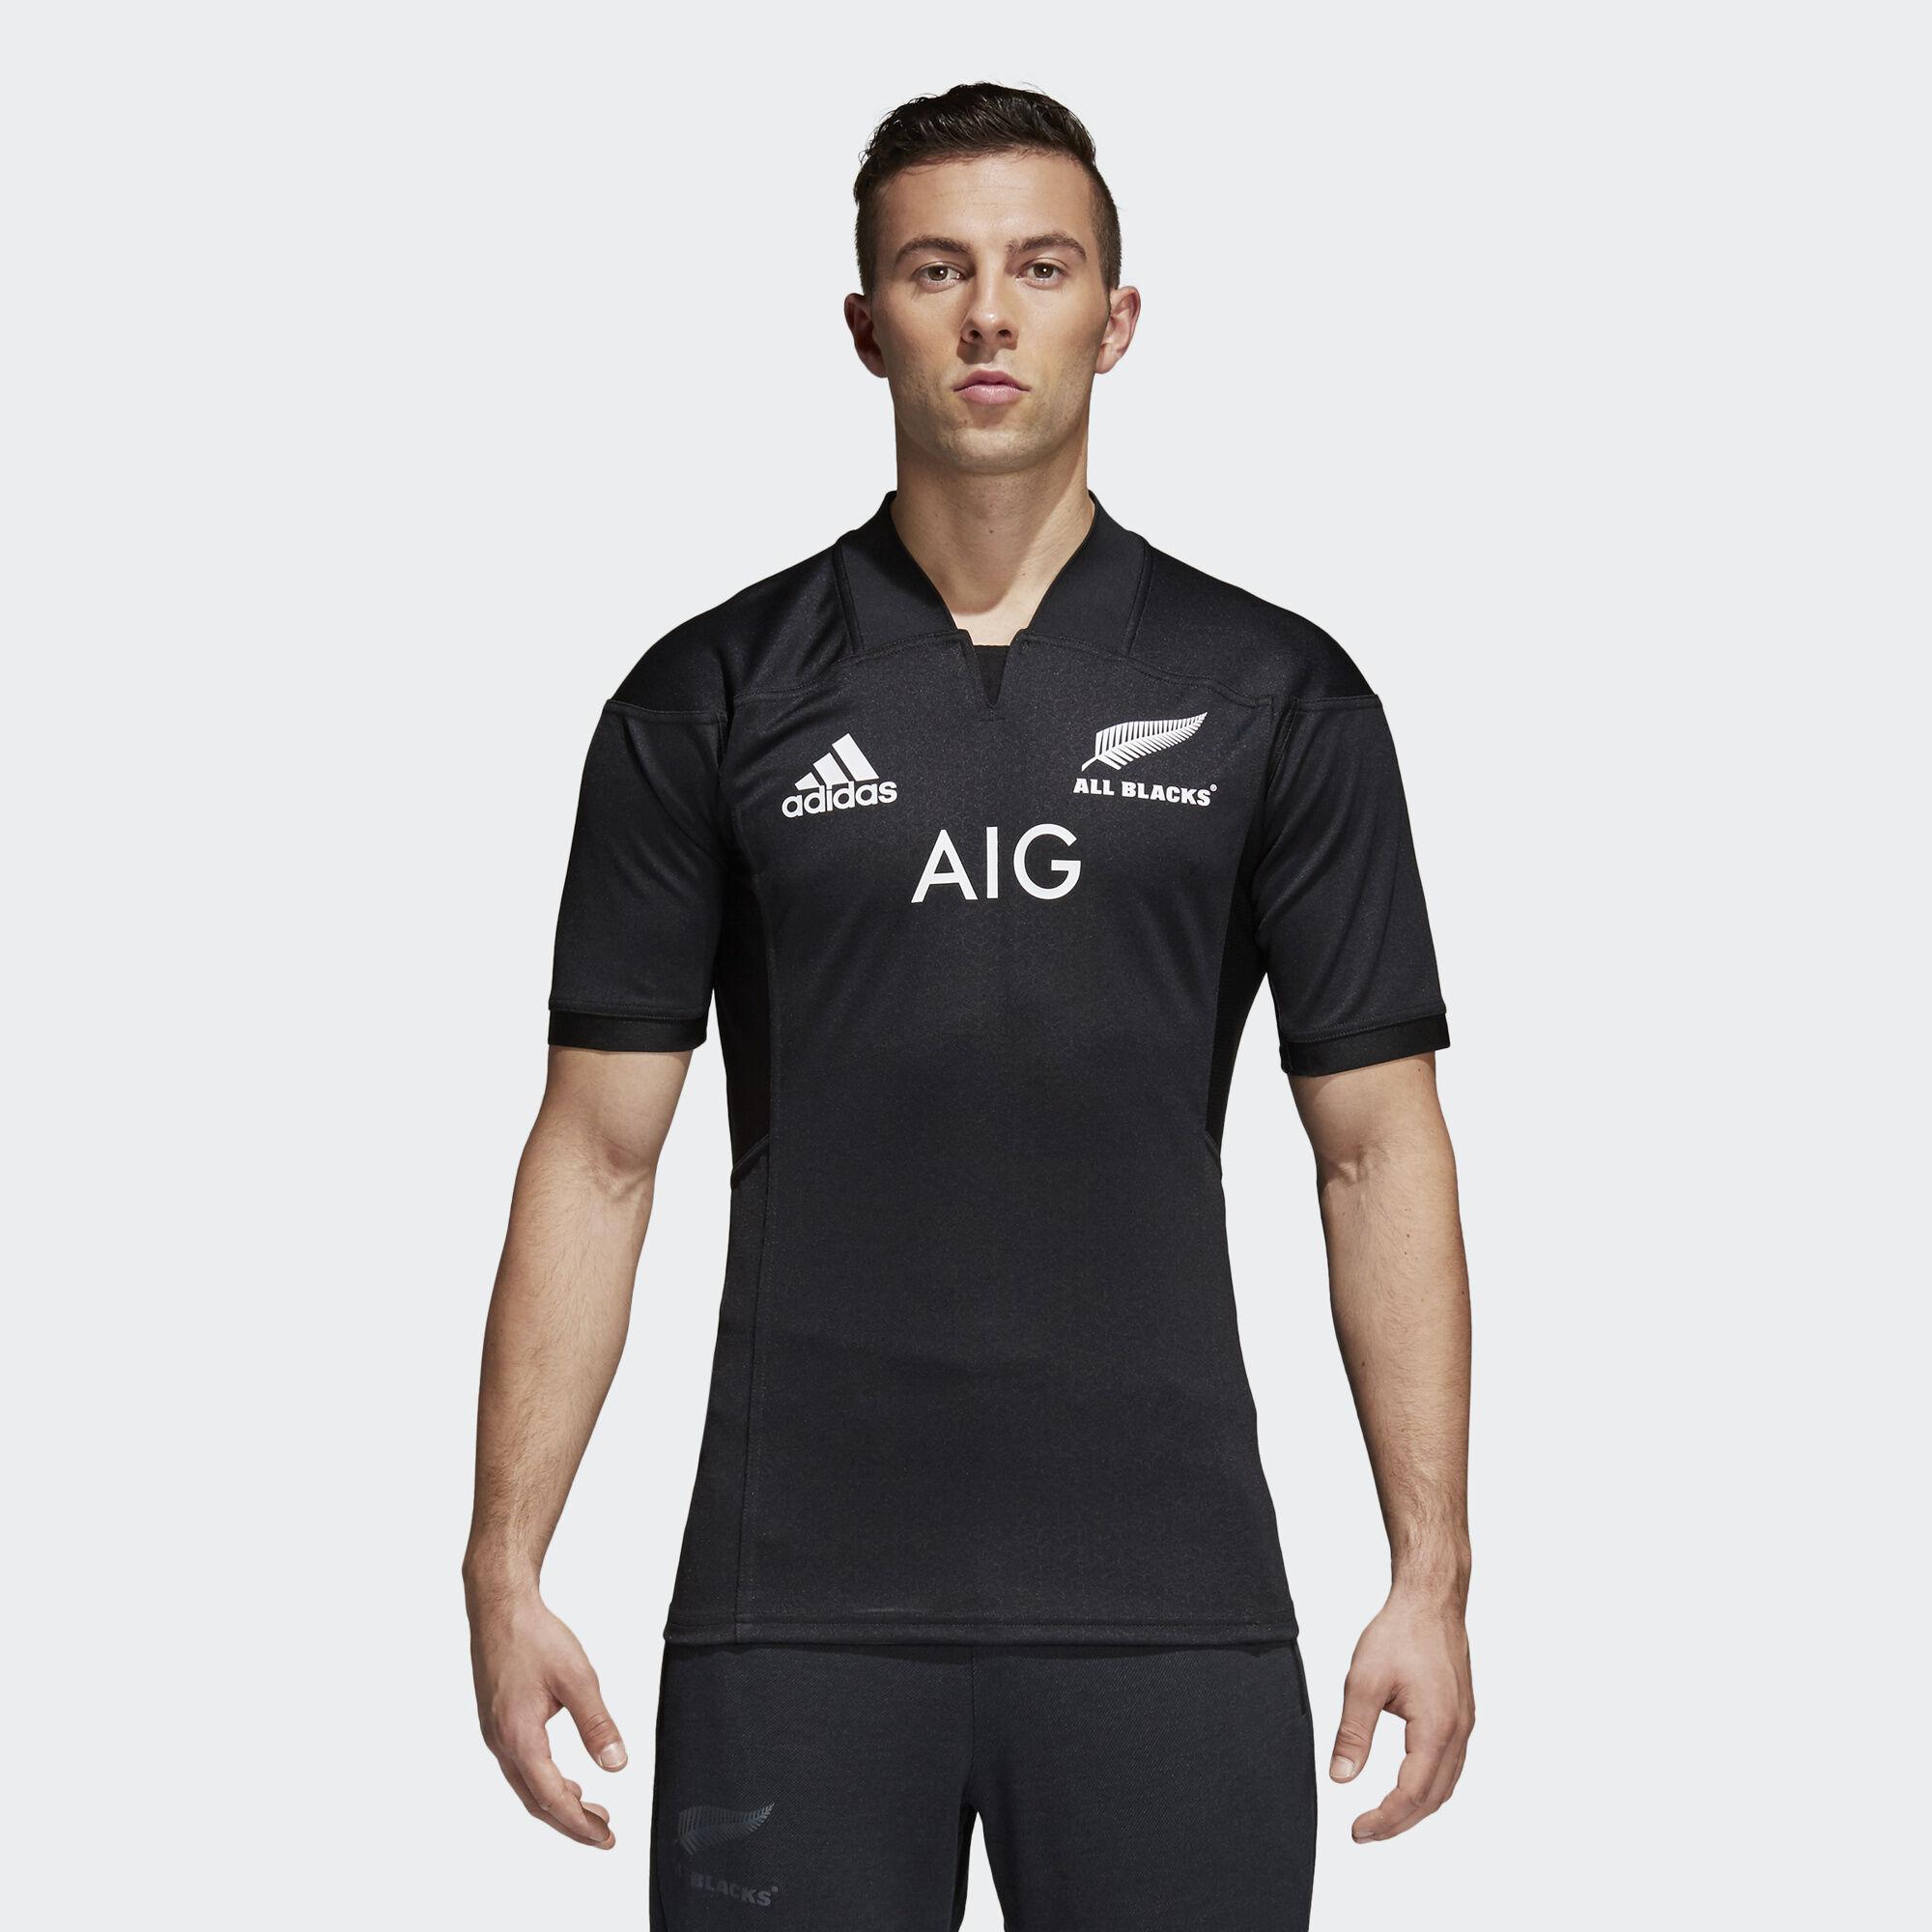 adidas - All Blacks Home Replica Jersey Black AP5663. Men Rugby